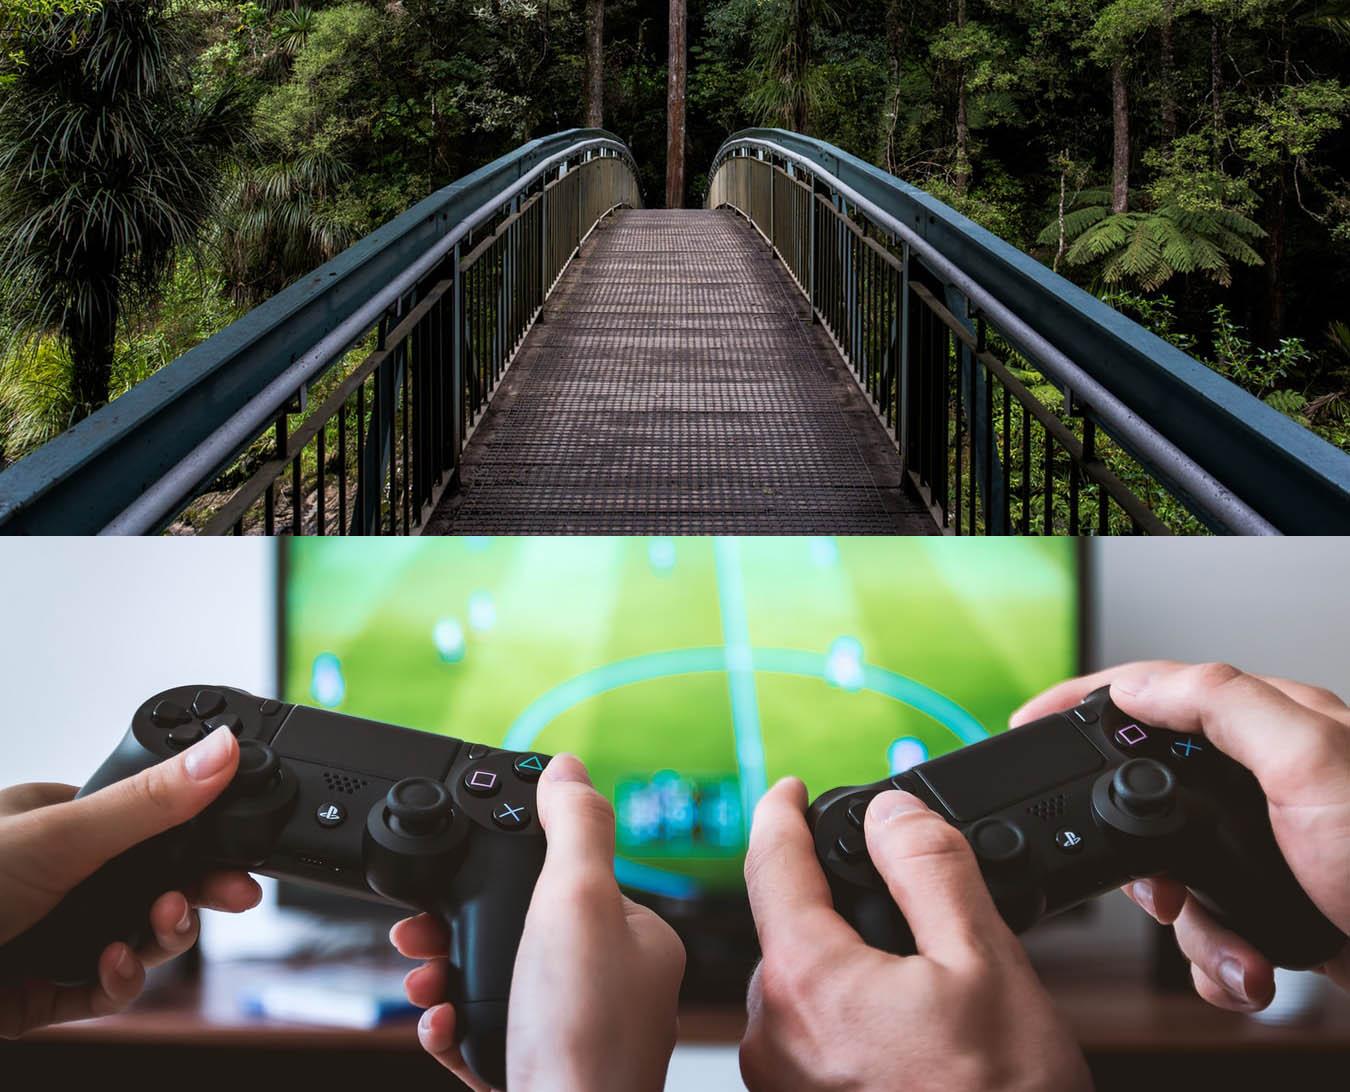 Online Gaming Vs. Outdoor Gaming